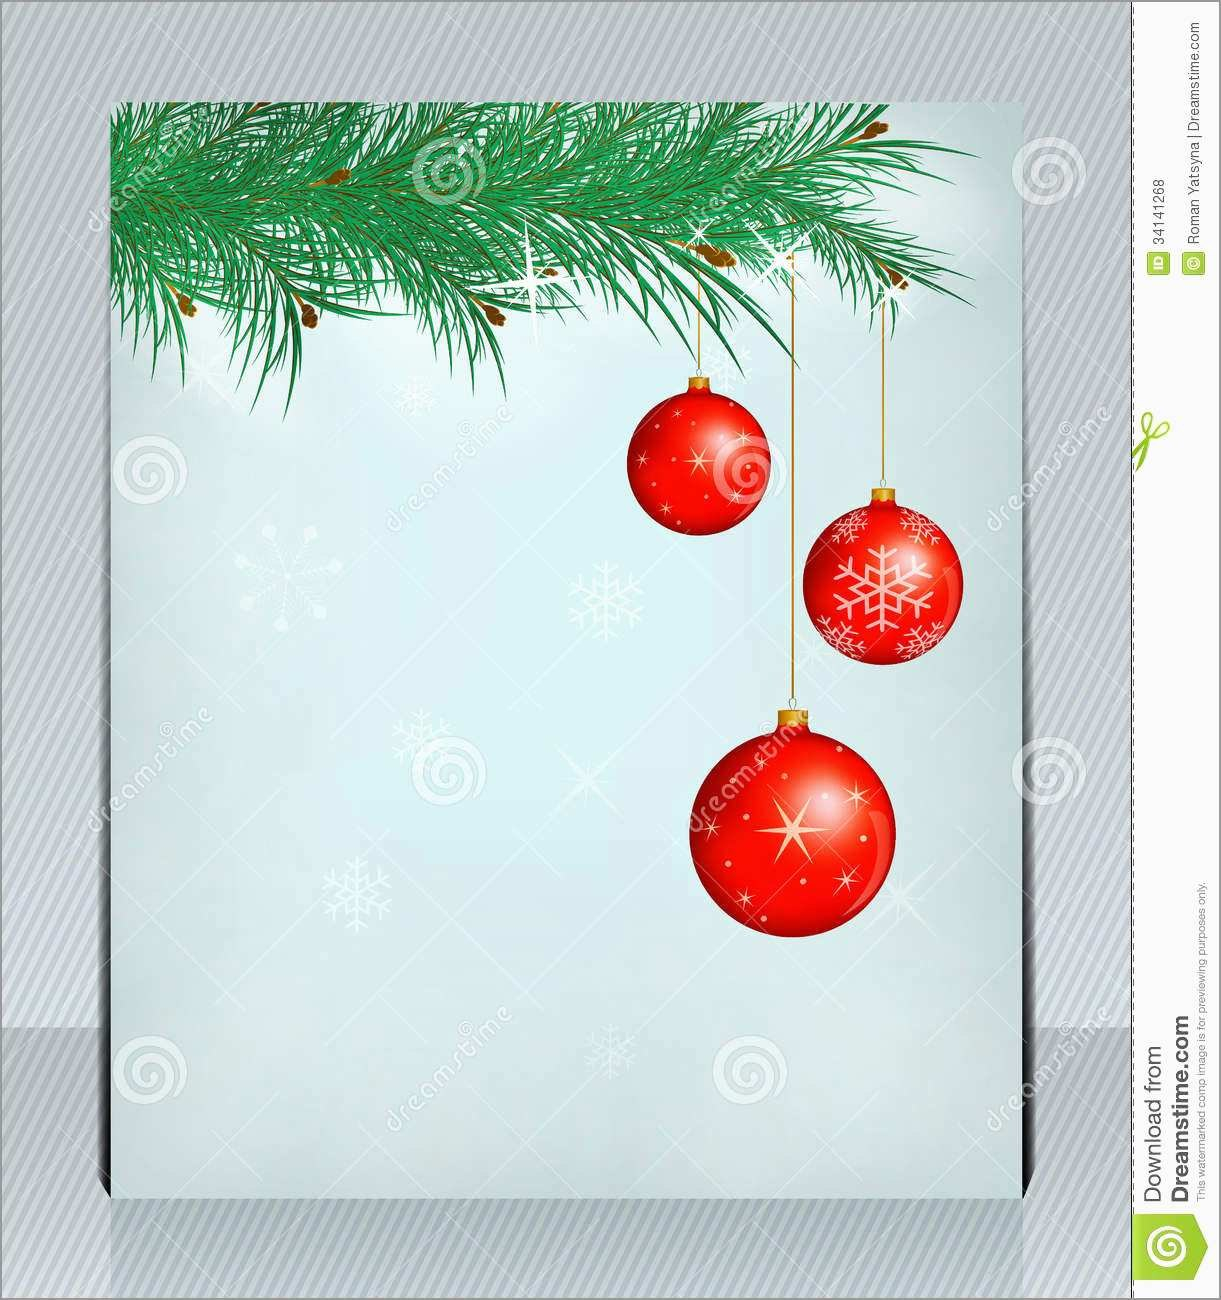 Best Of Free Christmas Brochure Templates  Best Of Template With Regard To Christmas Brochure Templates Free